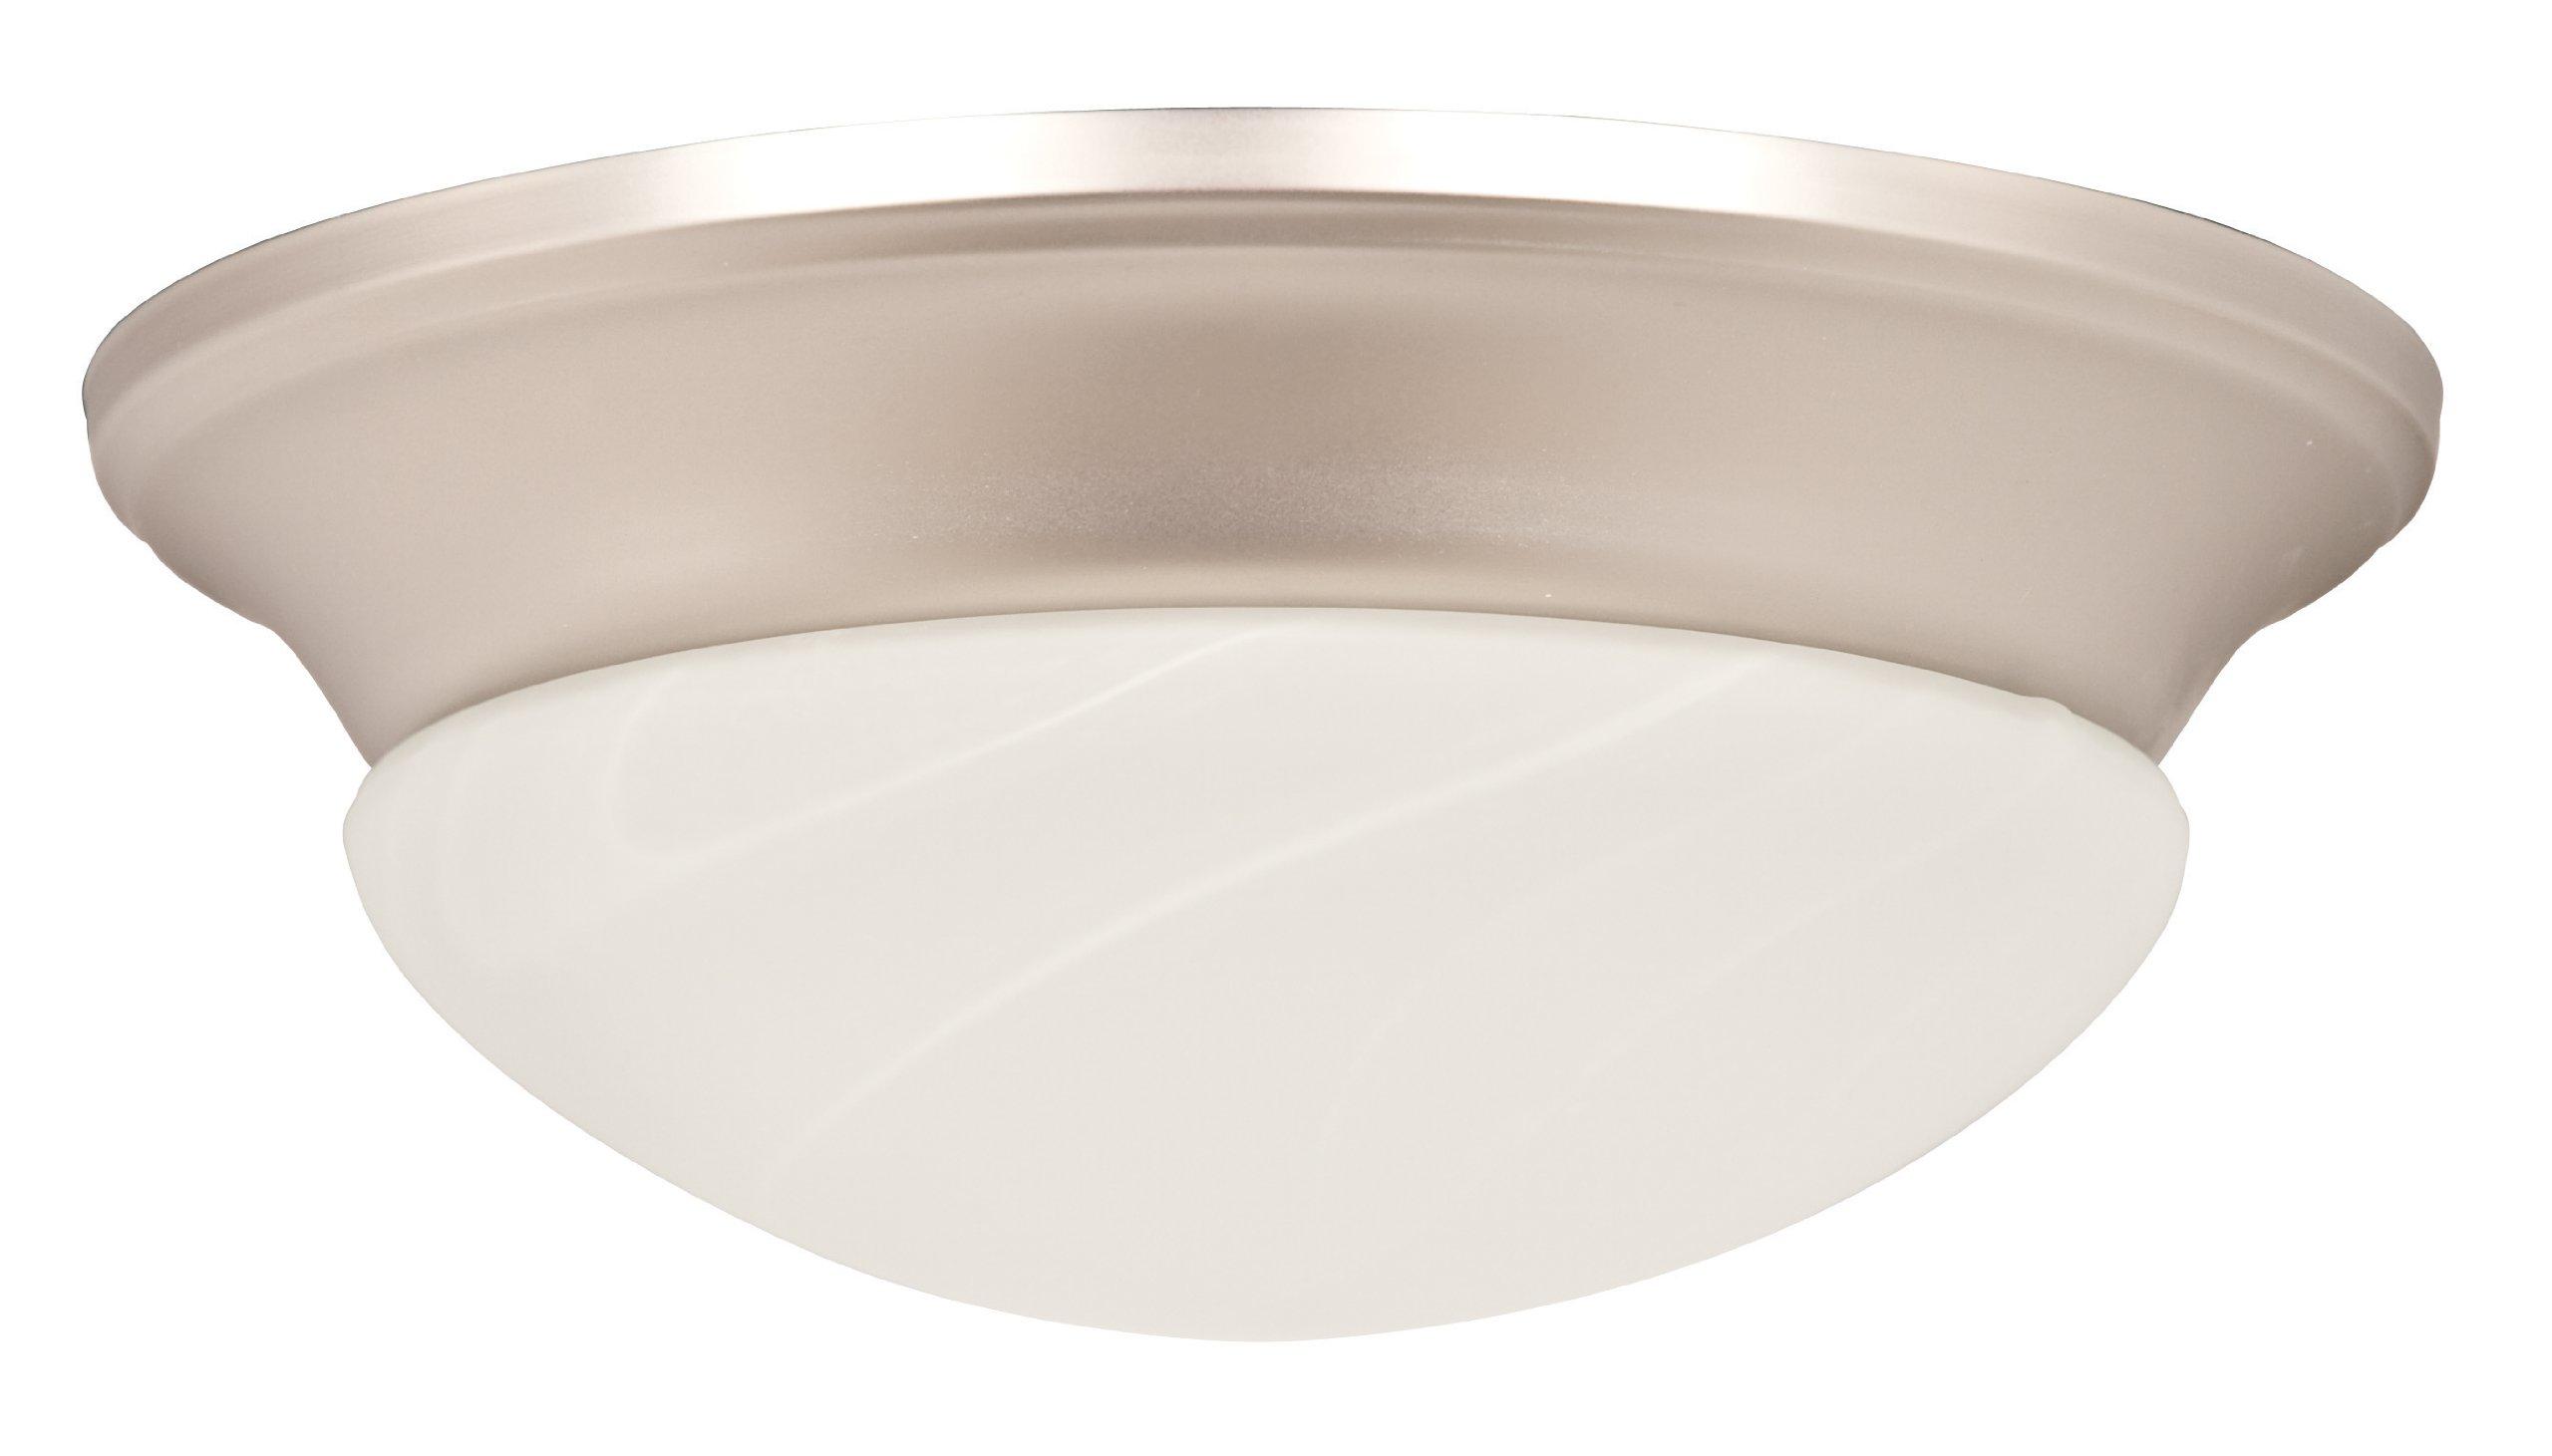 Sunset Lighting F7767-53 Fan Light Kit with Faux Alabaster Twist on Glass, Satin Nickel Finish